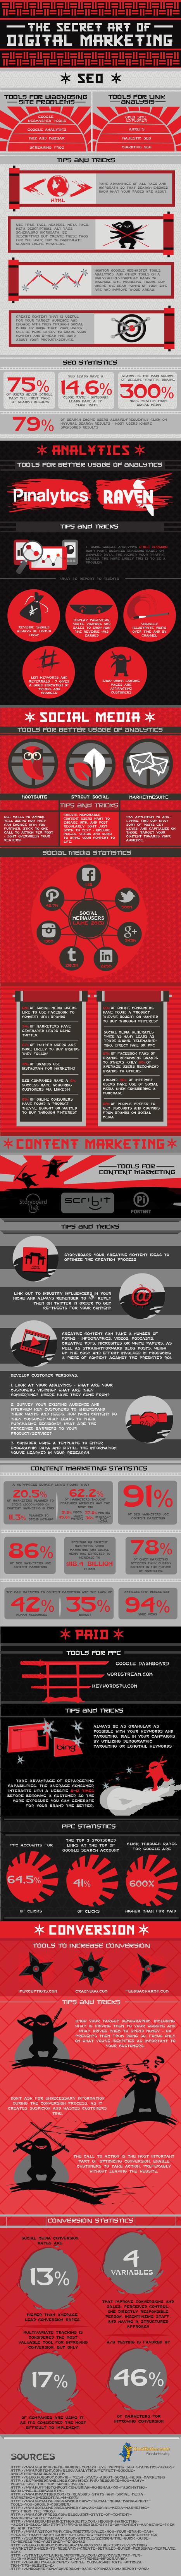 Infographic: The Secret Art of Digital Marketing - HostGator | #TheMarketingAutomationAlert | platforms and tips | Scoop.it